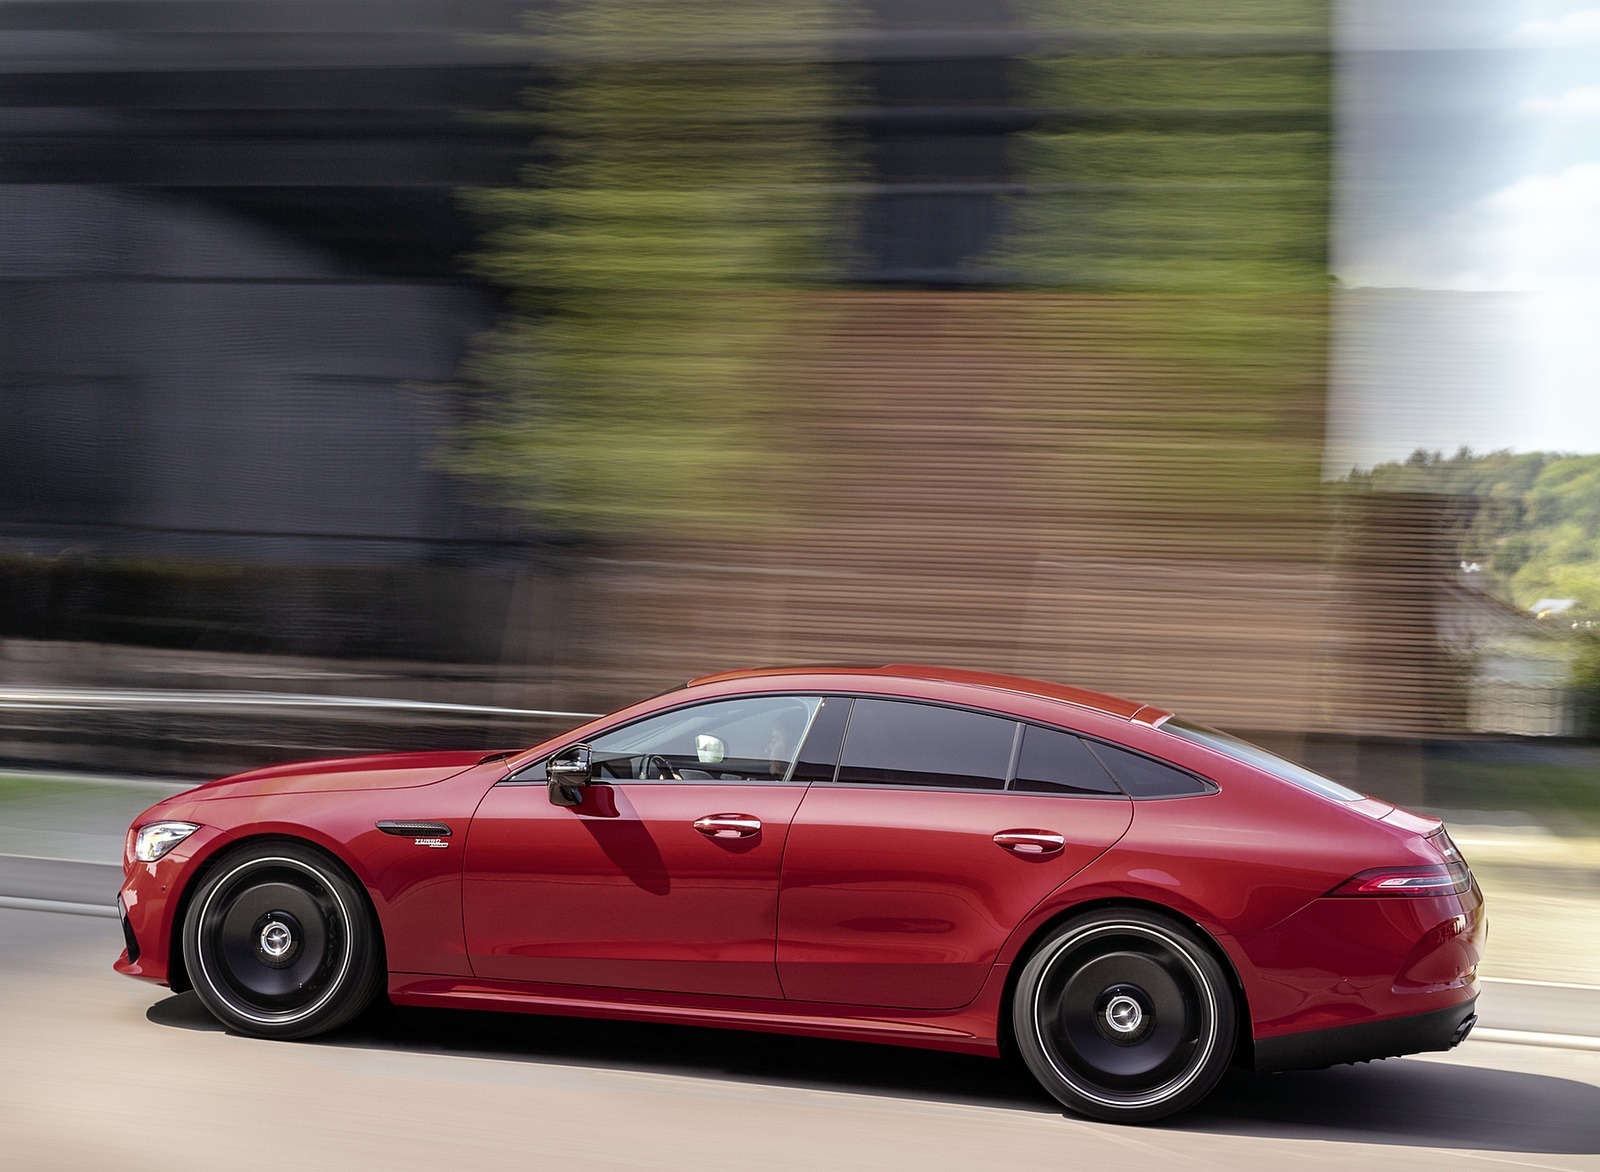 2019 Mercedes-AMG GT 43 4MATIC+ 4-Door Coupé (Color: Jupiter Red) Side Wallpapers (2)